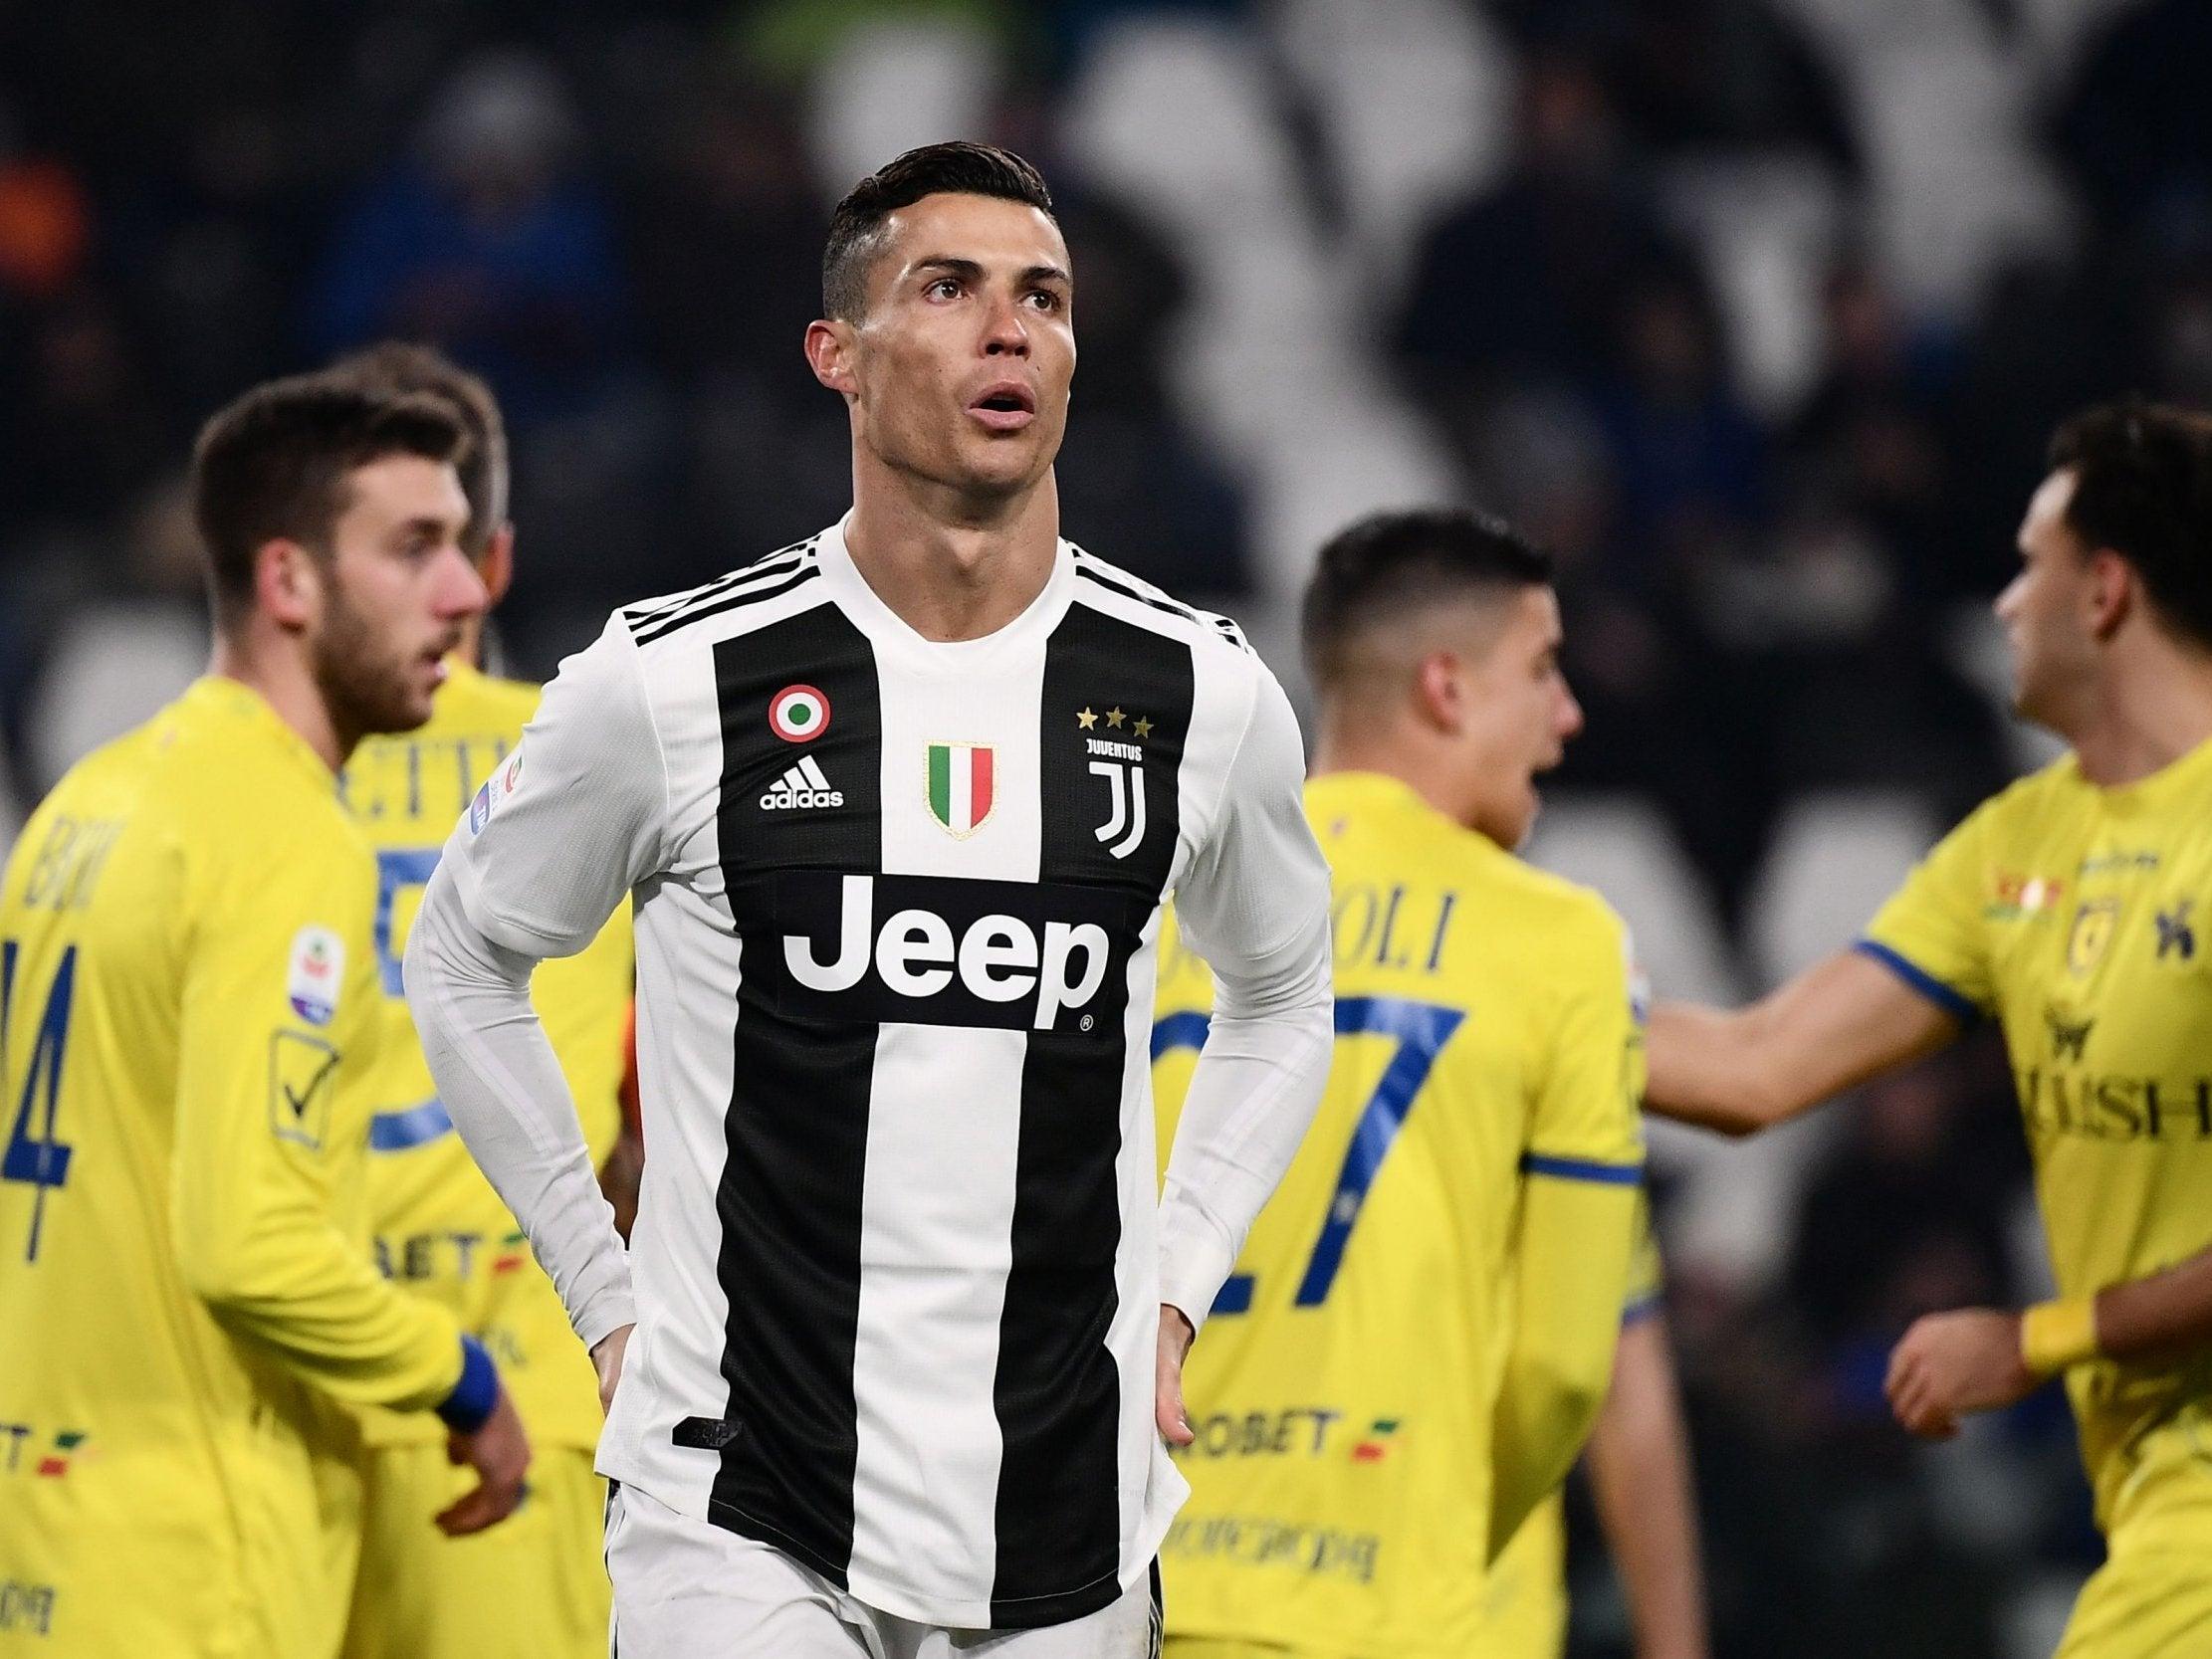 Cristiano Ronaldo reveals lost bet with Juventus manager Massimiliano Allegri